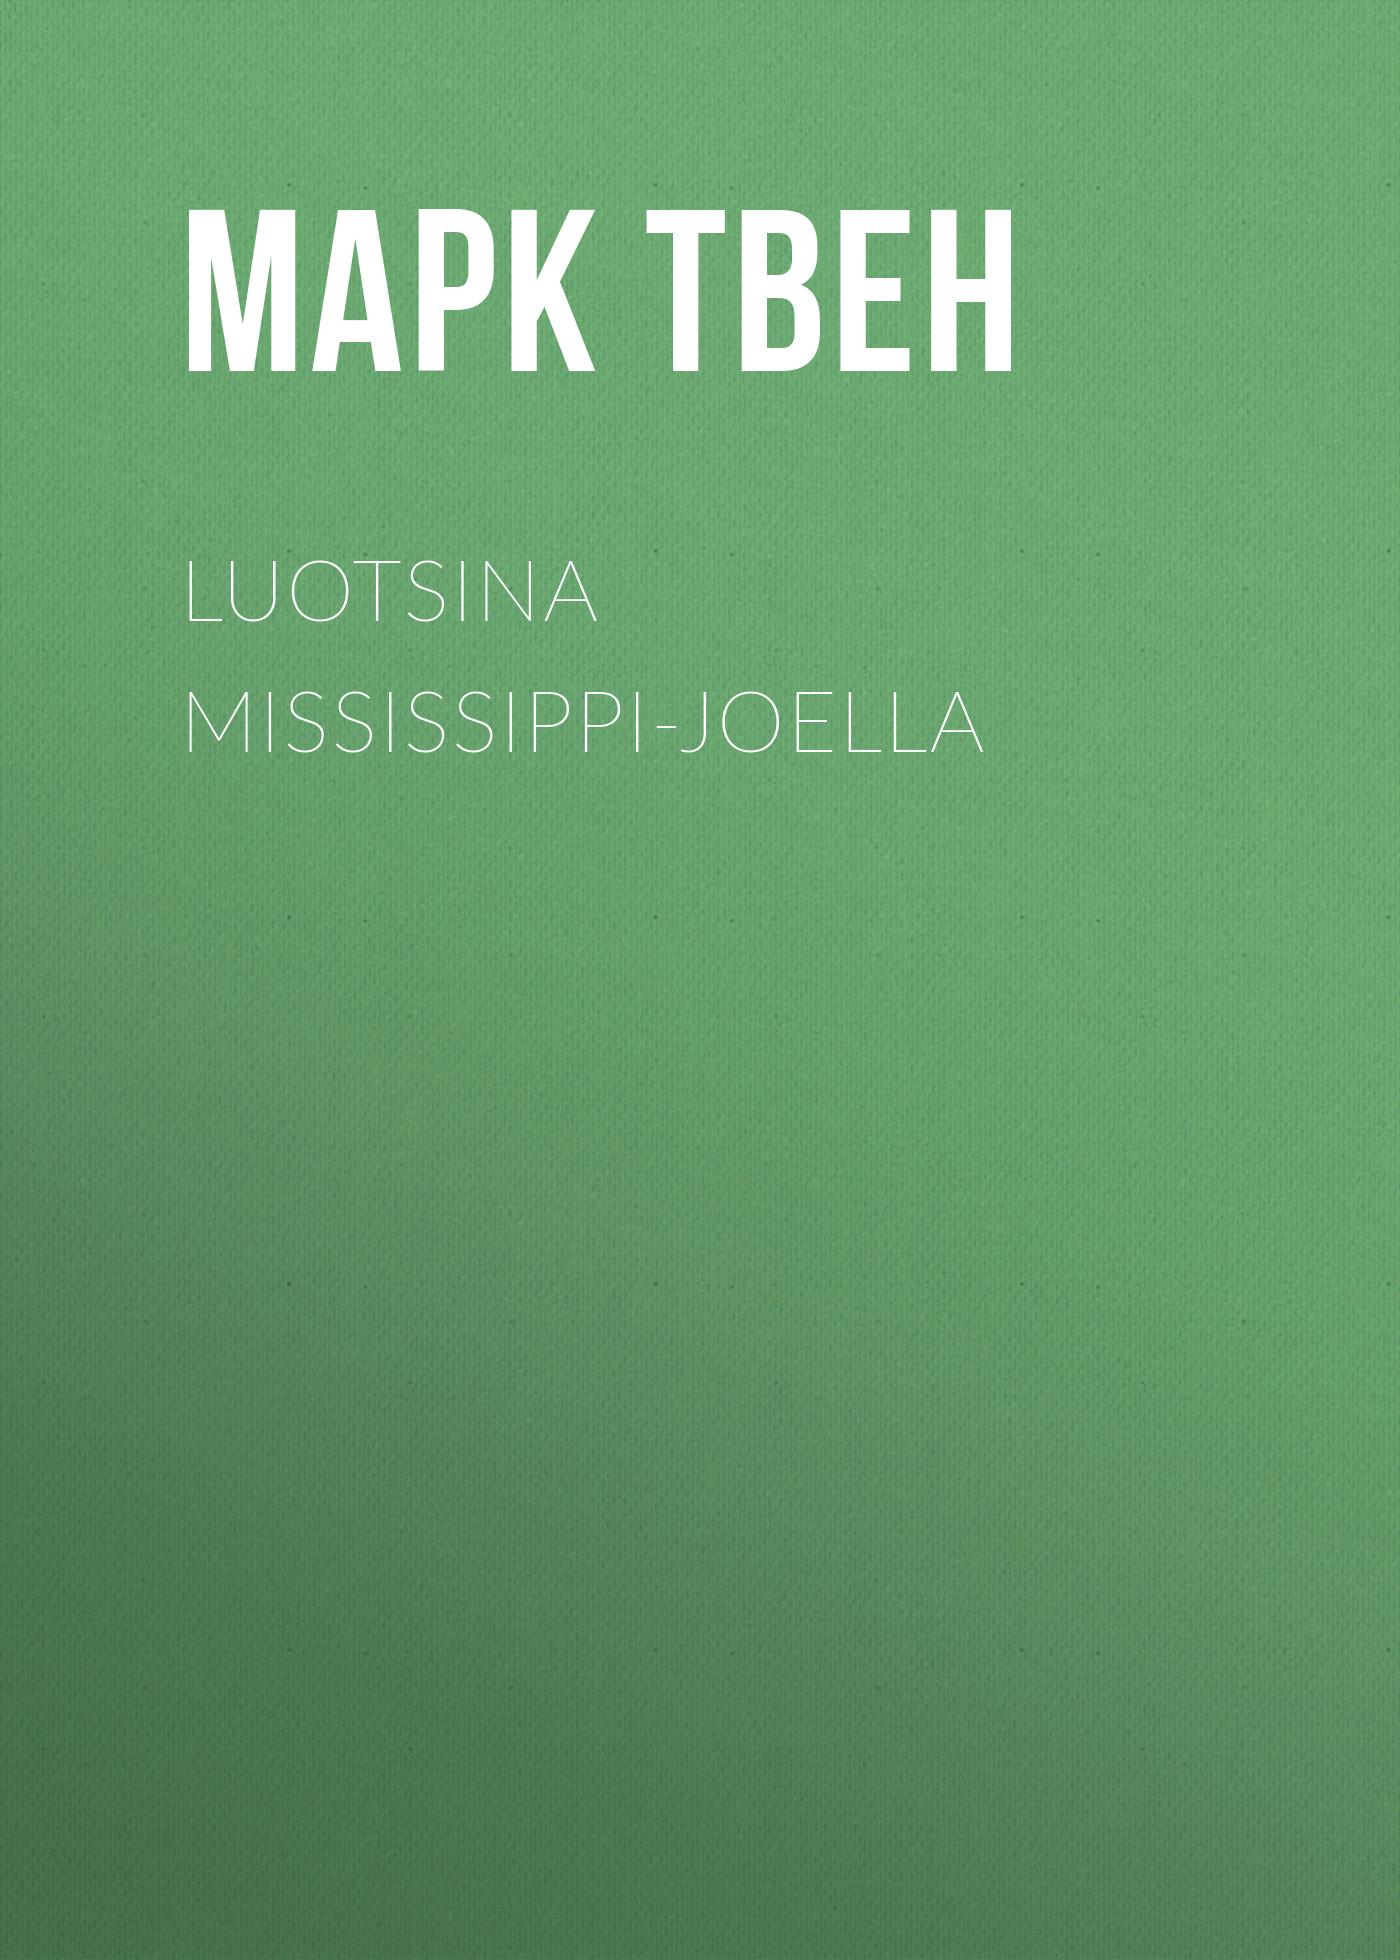 Luotsina Mississippi-joella